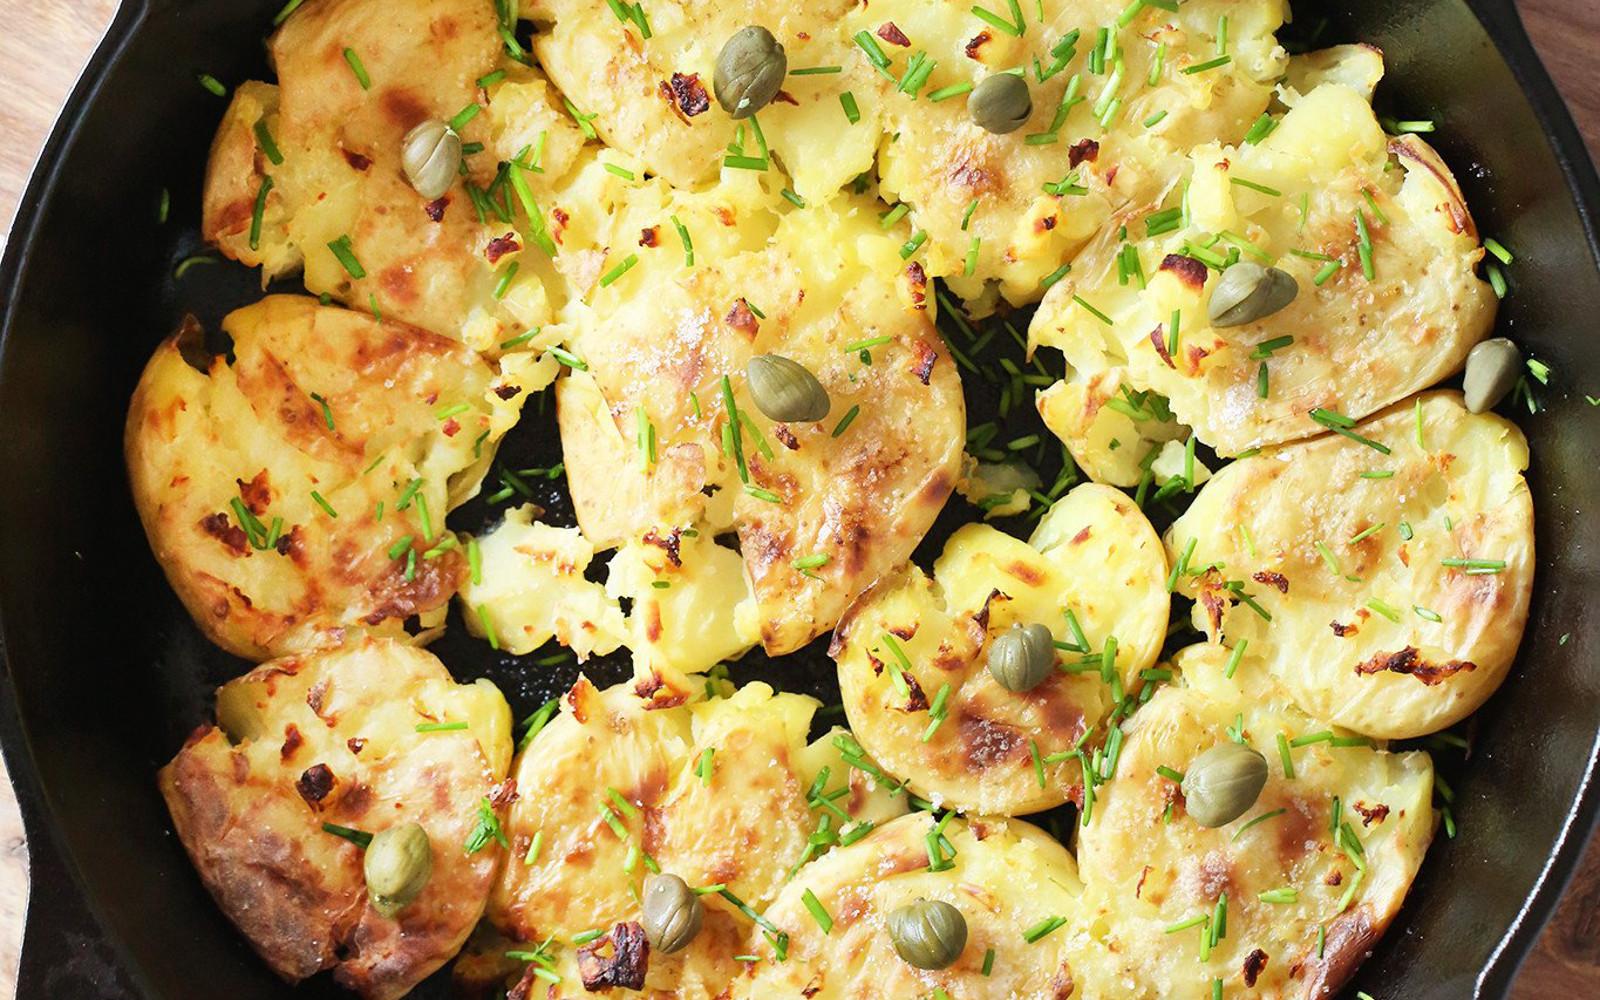 Crispy Smashed Potatoes with Caper Aioli